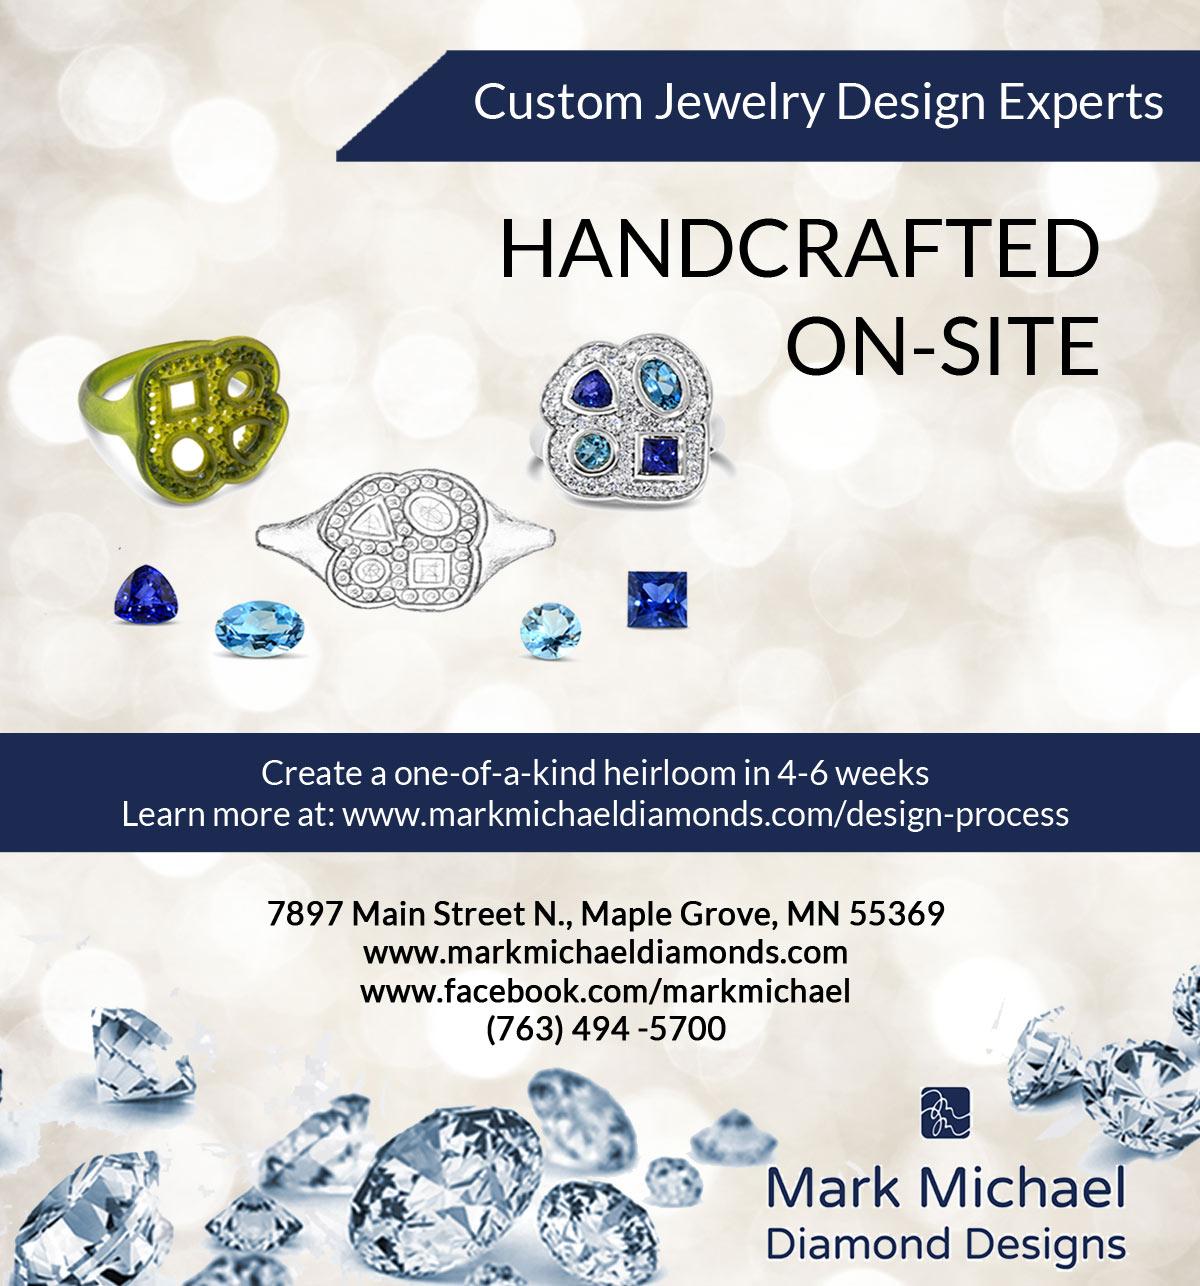 Mark-Michael-Diamond-Designs-Custom-Jewelry-Experts.jpg